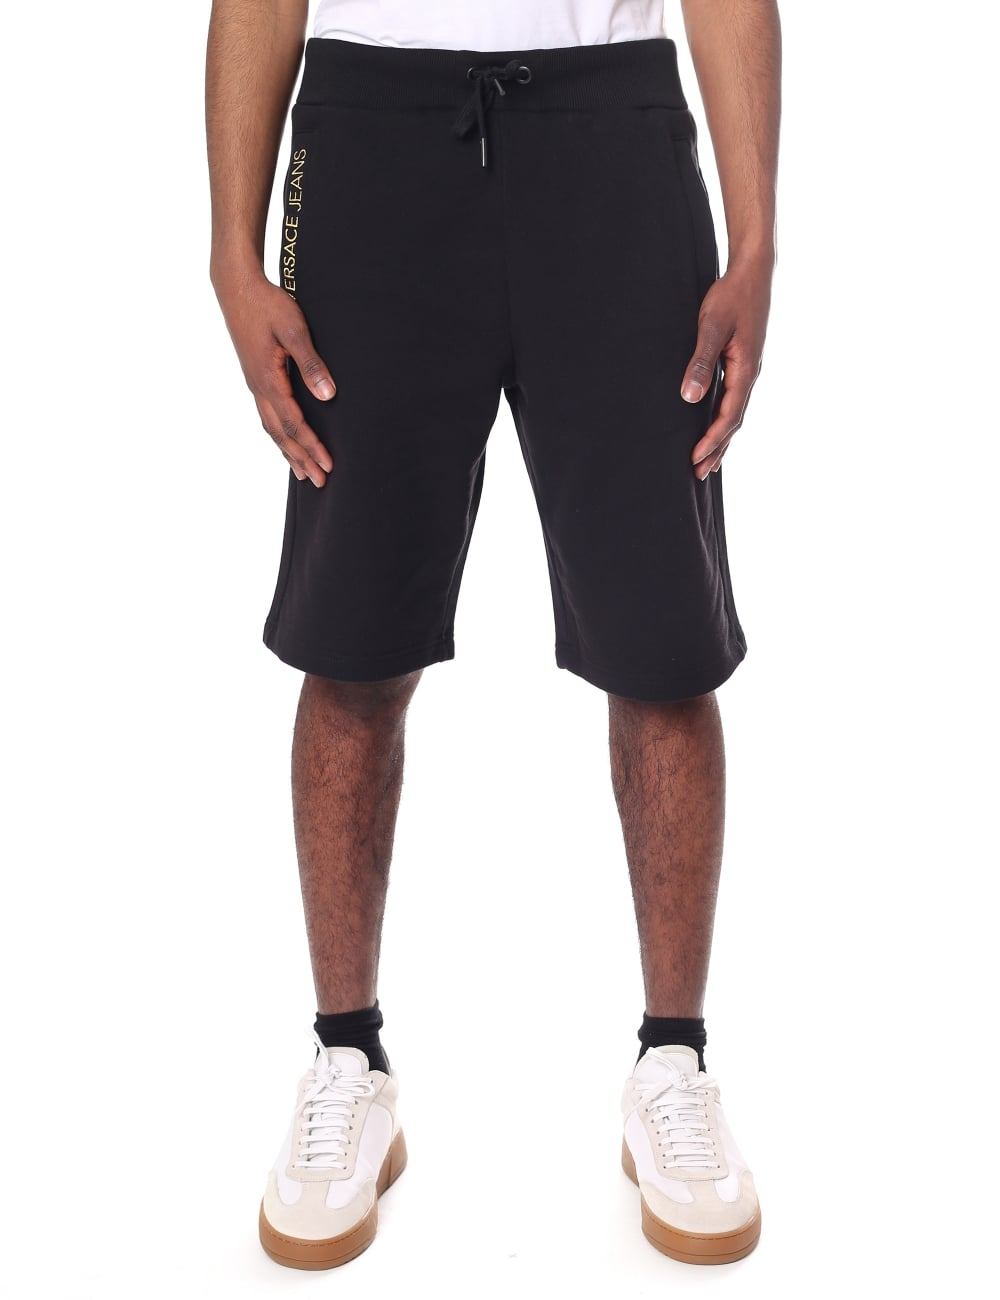 Shorts Embroidered Waist Tie Logo Jeans Versace Men's Sweat fvbgI76ymY